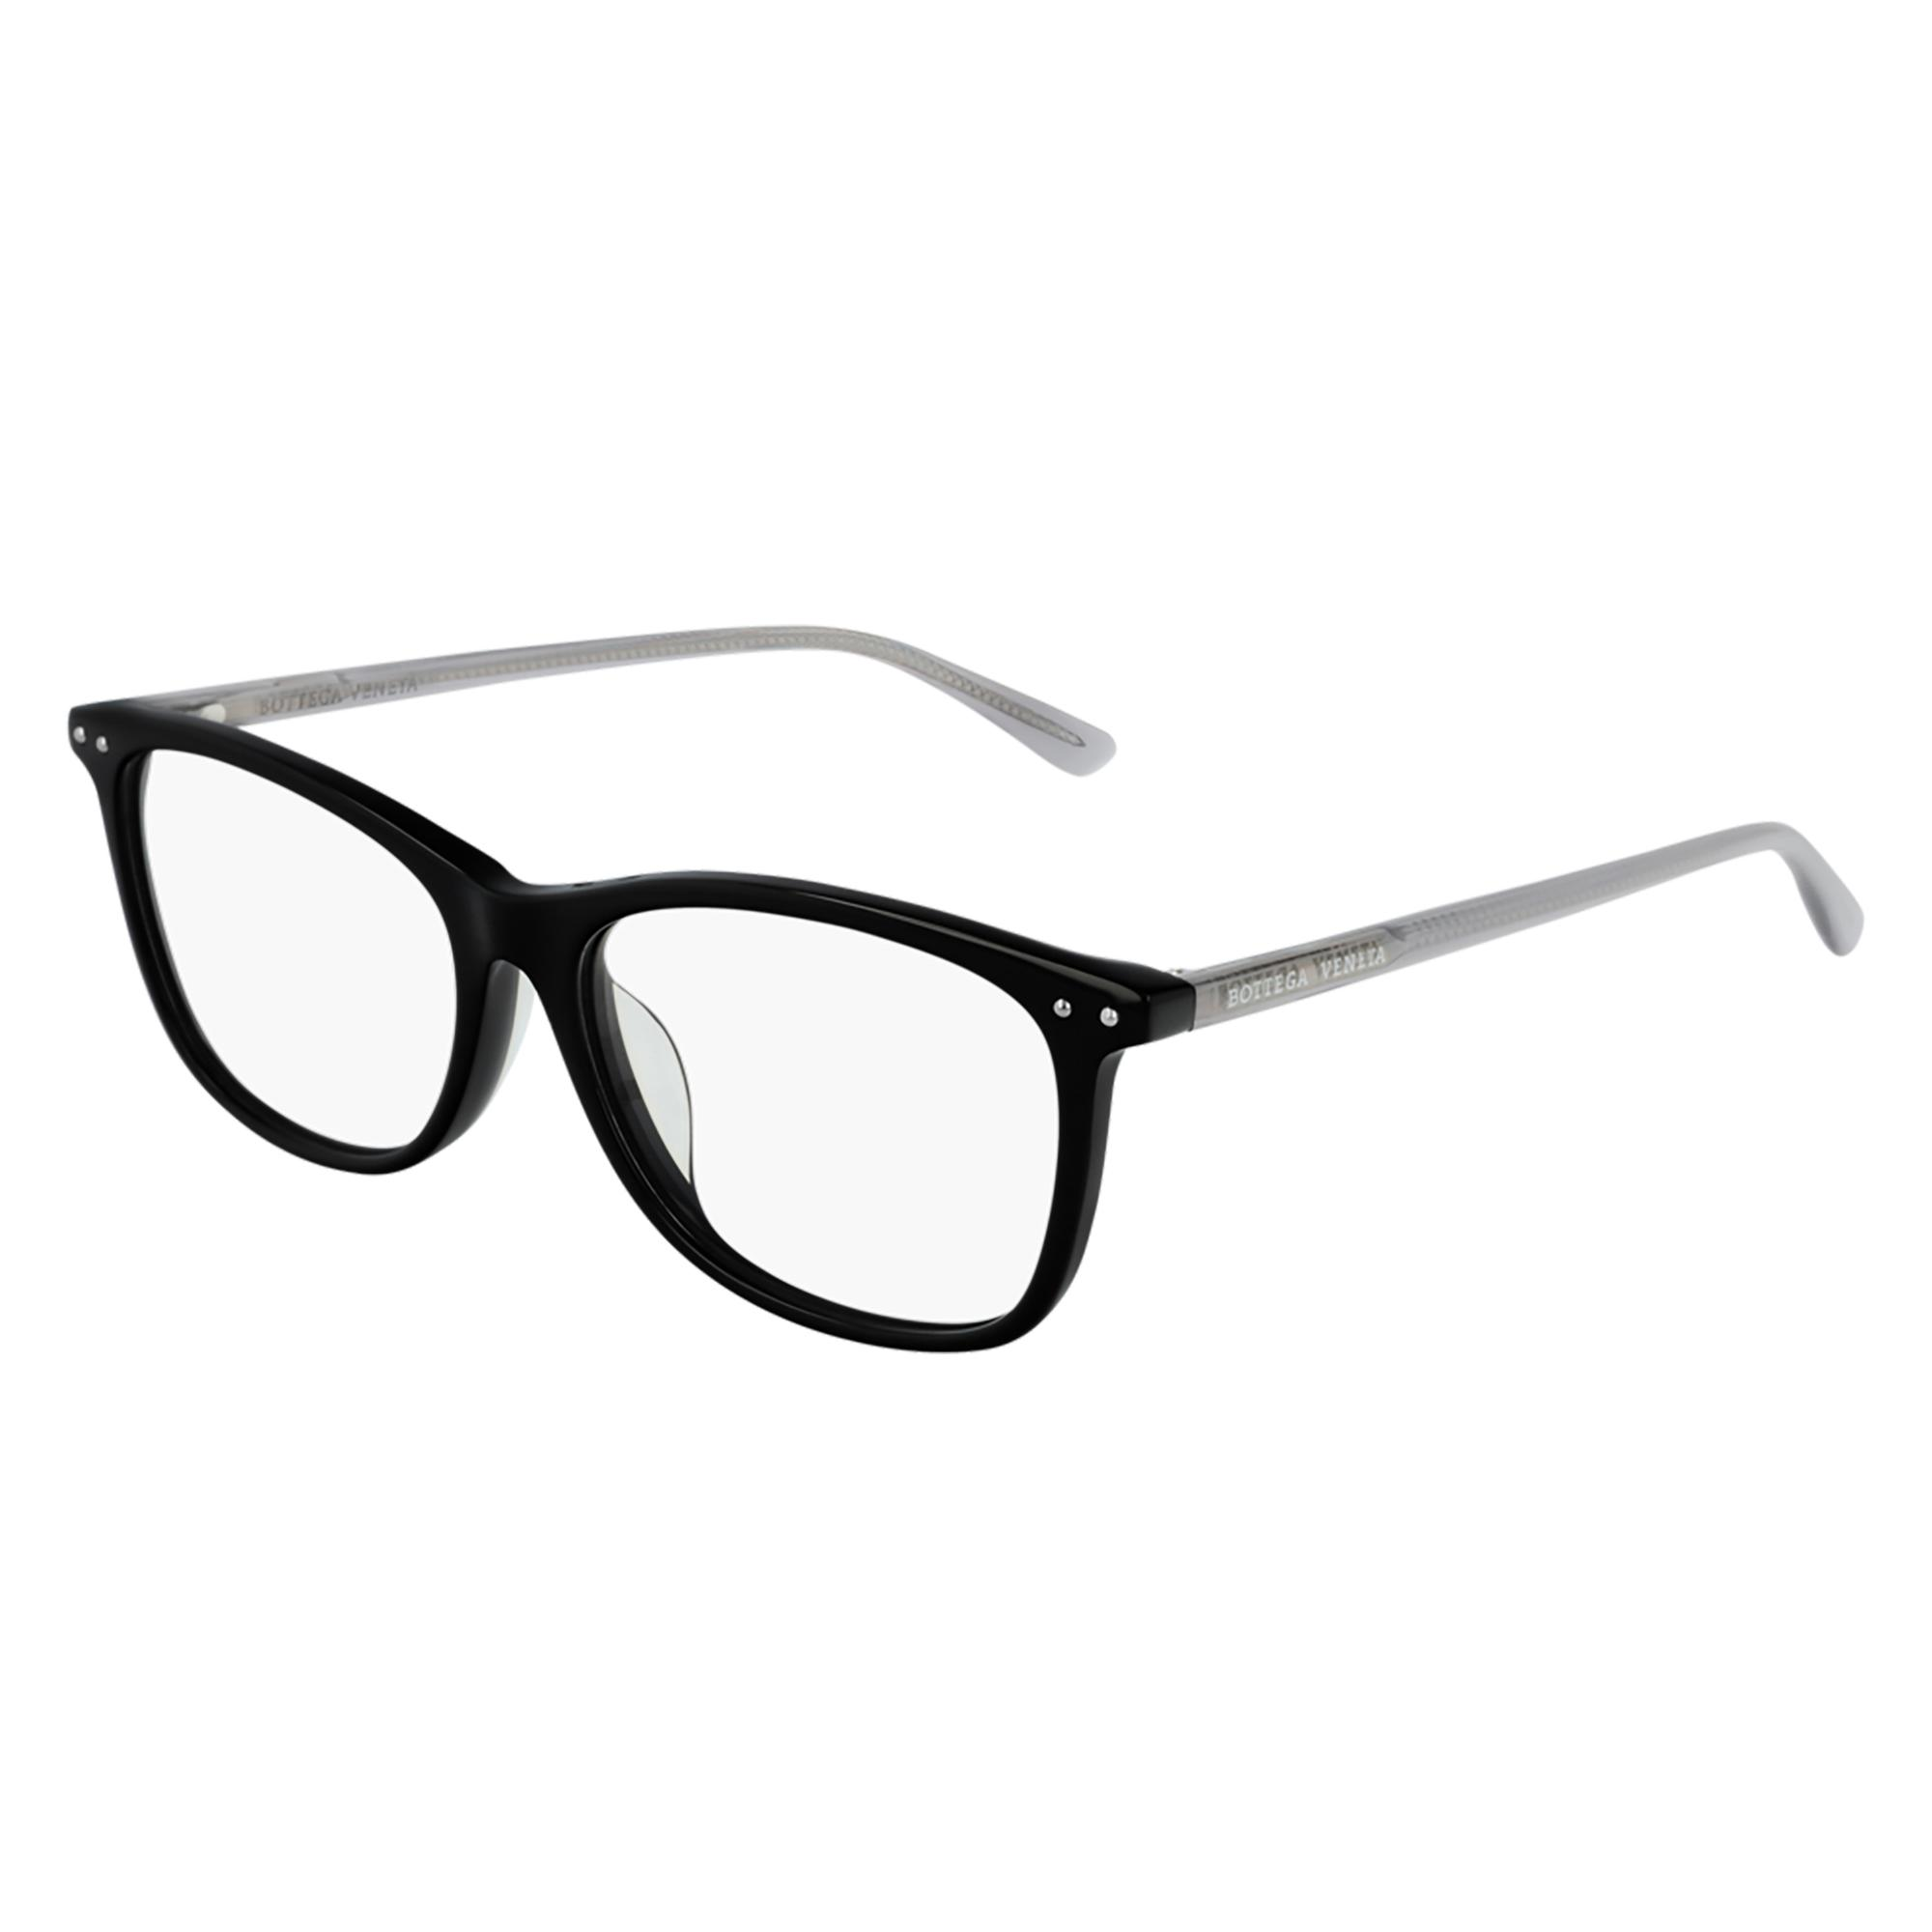 001 black grey transparen